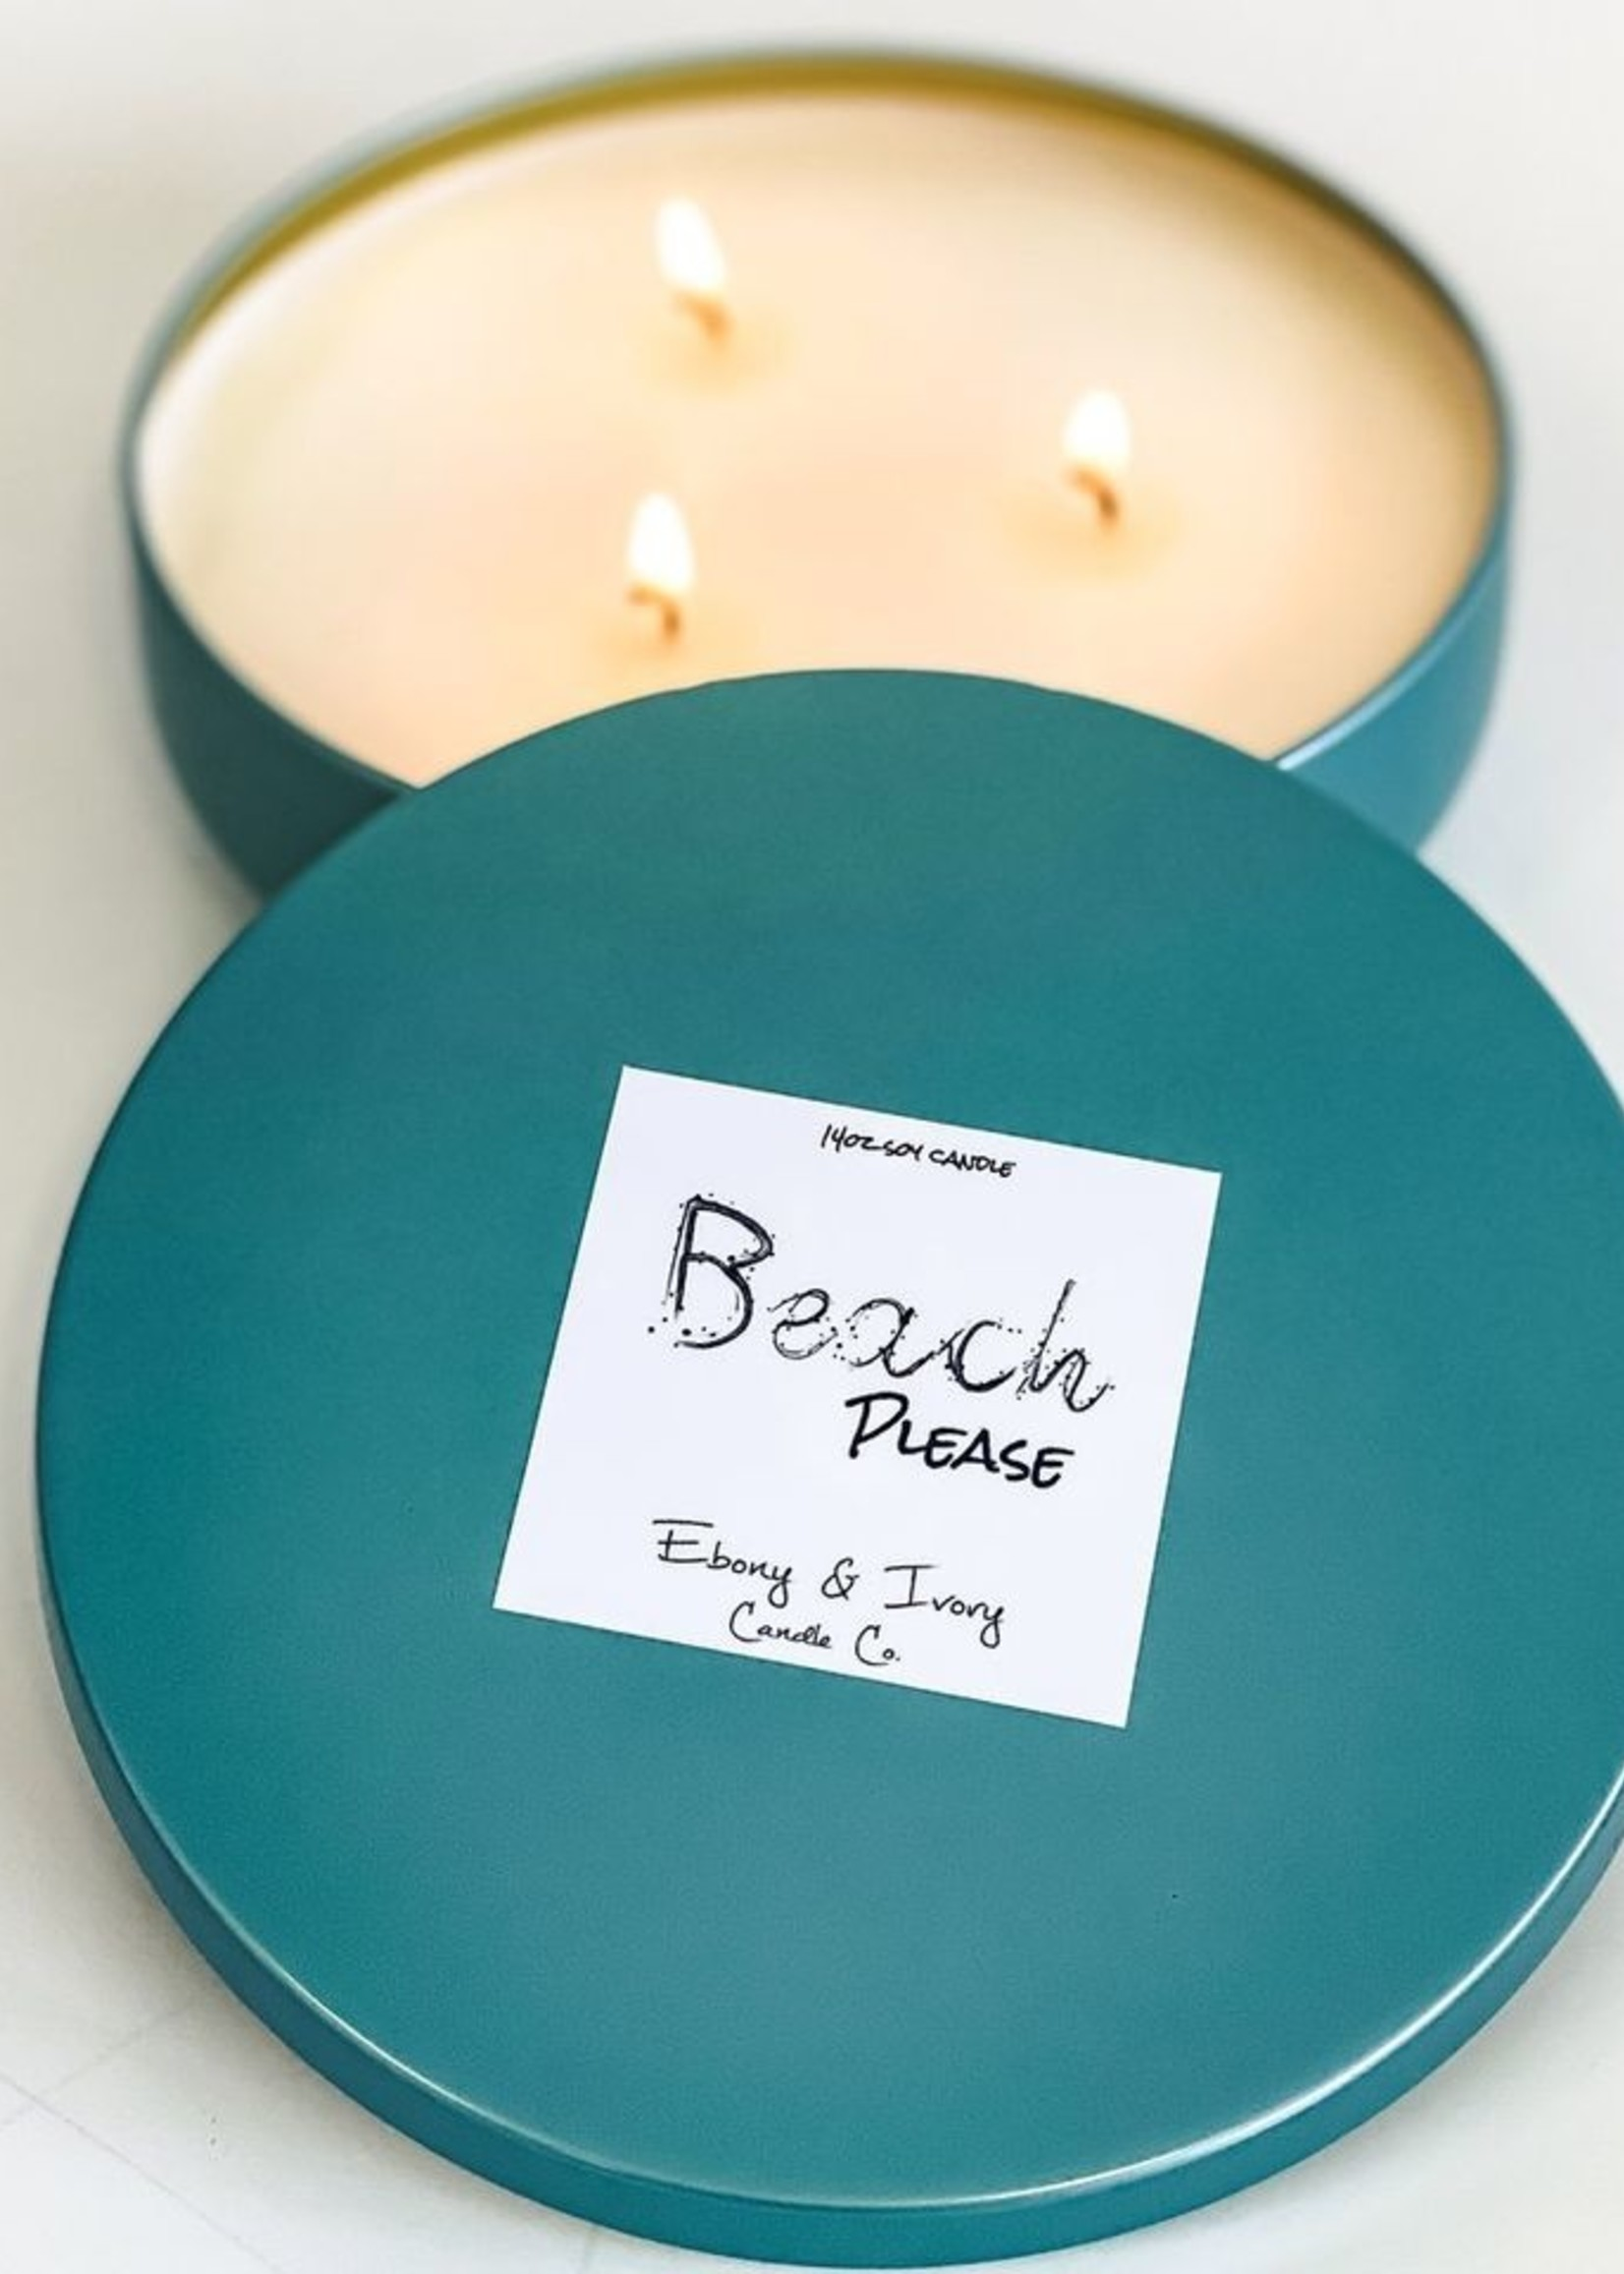 Ebony & Ivory Candle Co. Beach Please 14oz